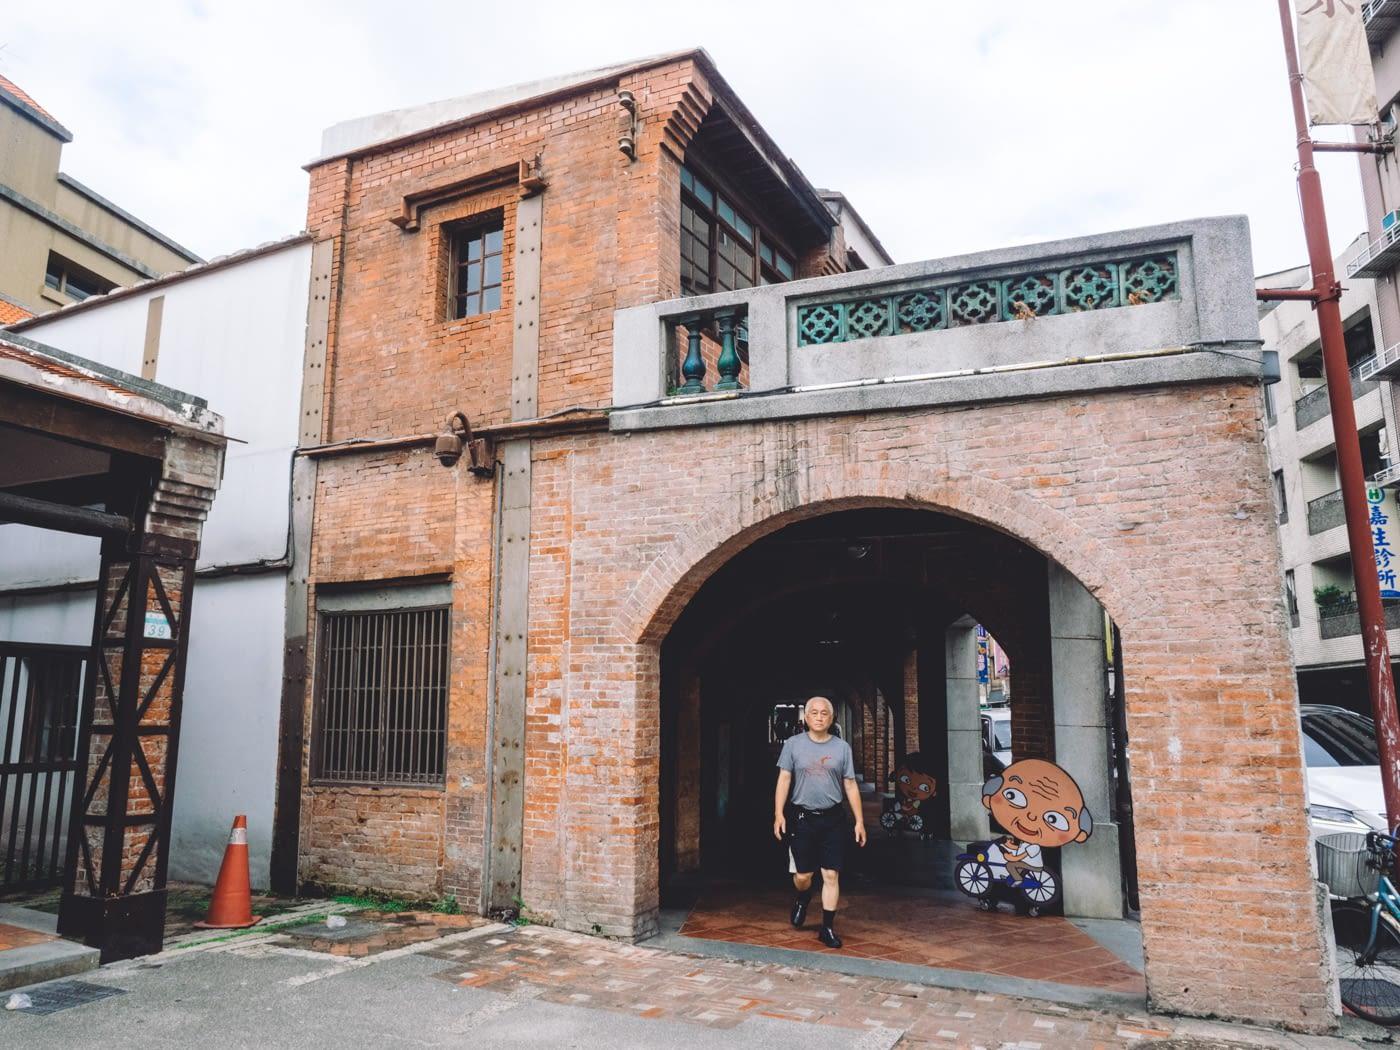 Taiwan - Taipei - Outside Longshan Temple